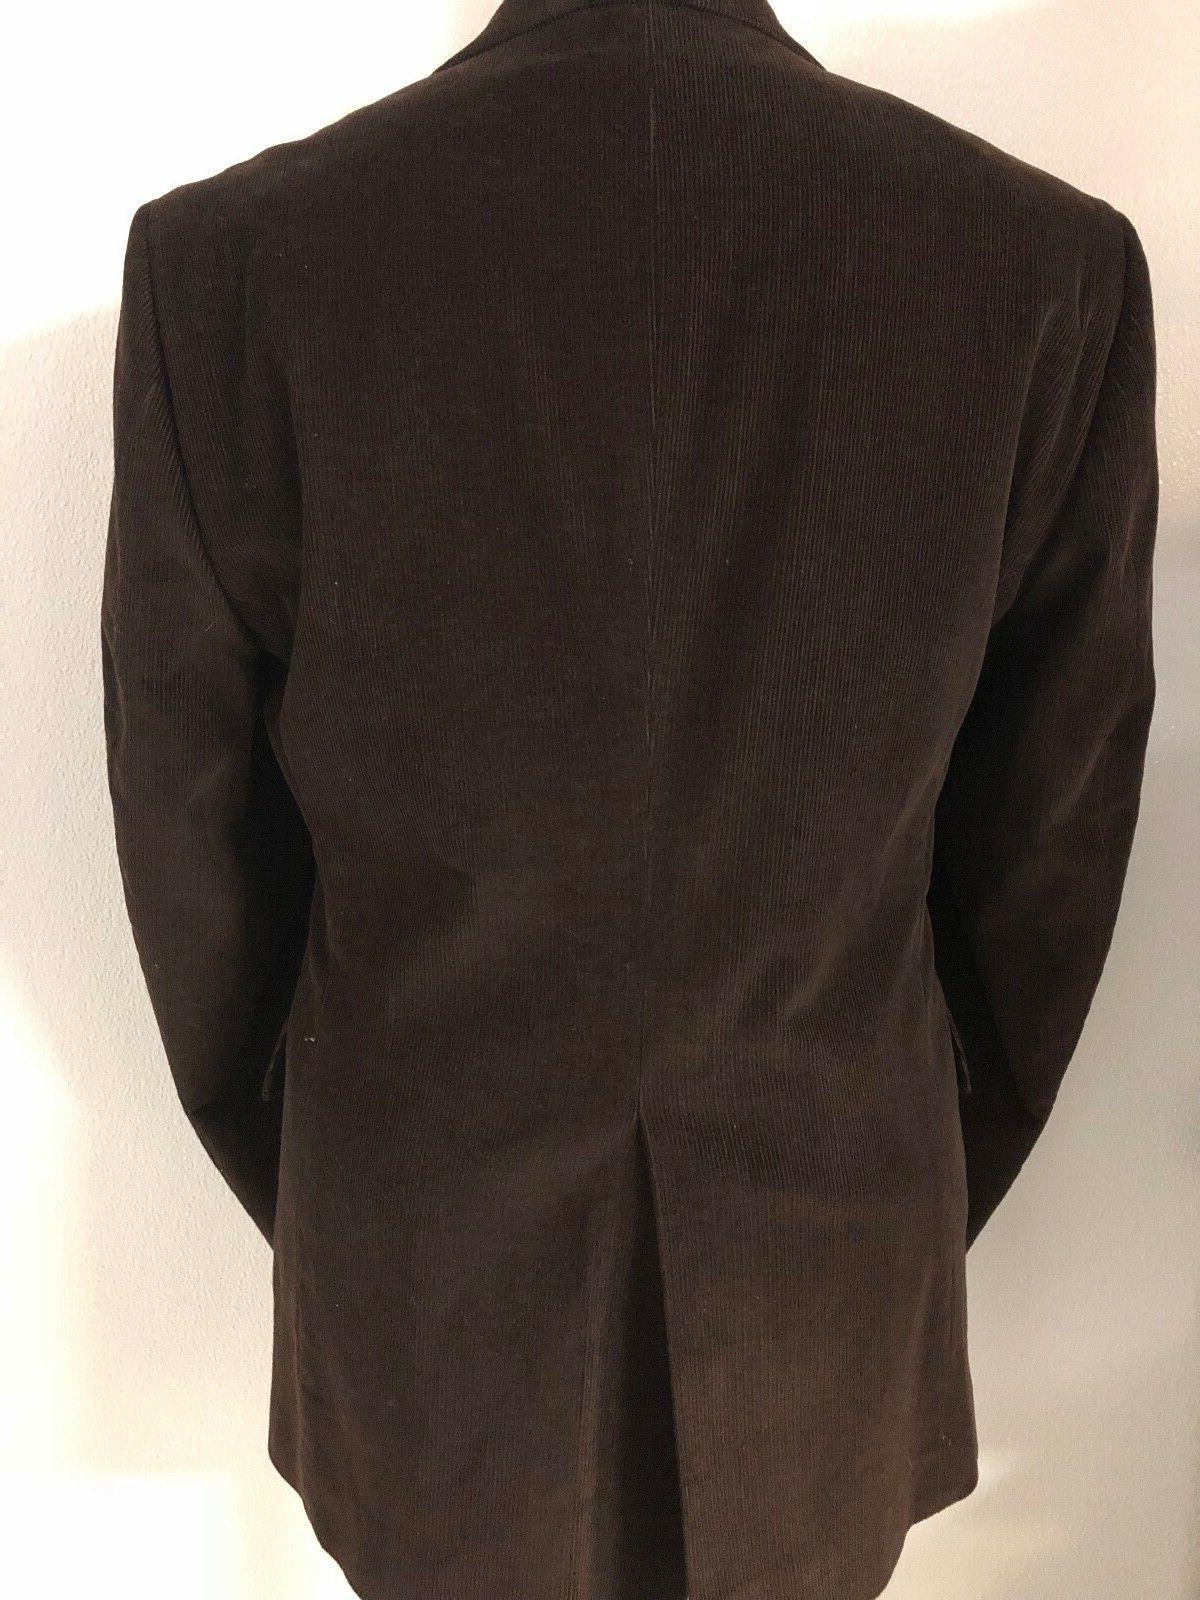 DOCKERS 40R Cotton Blazer Suit NEW